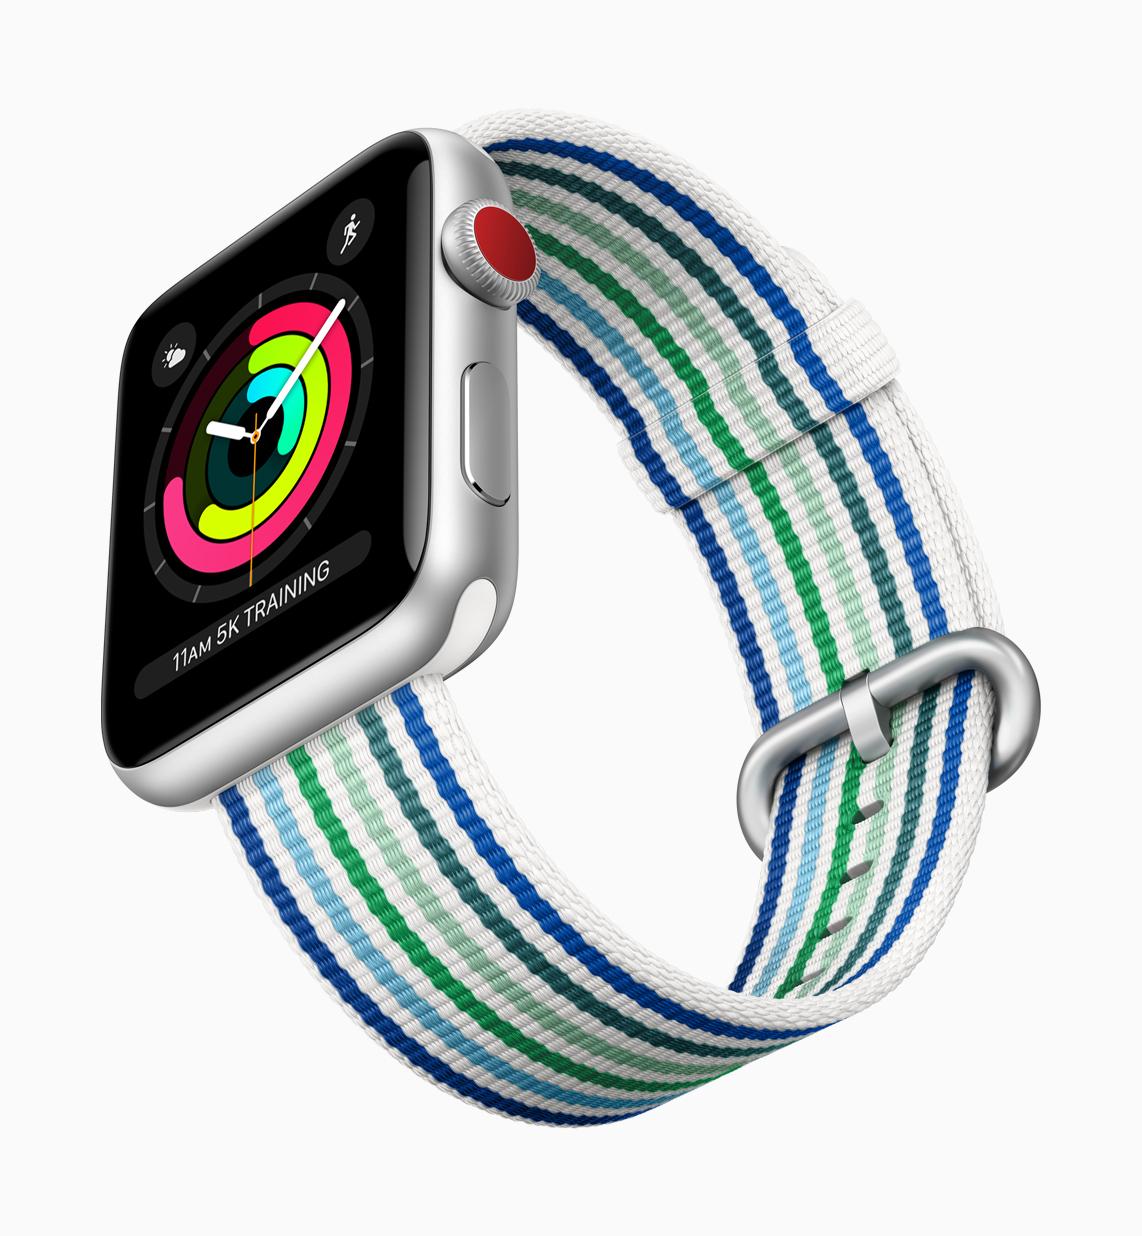 Apple Watch Series 3 Autumn new stirpe woven band